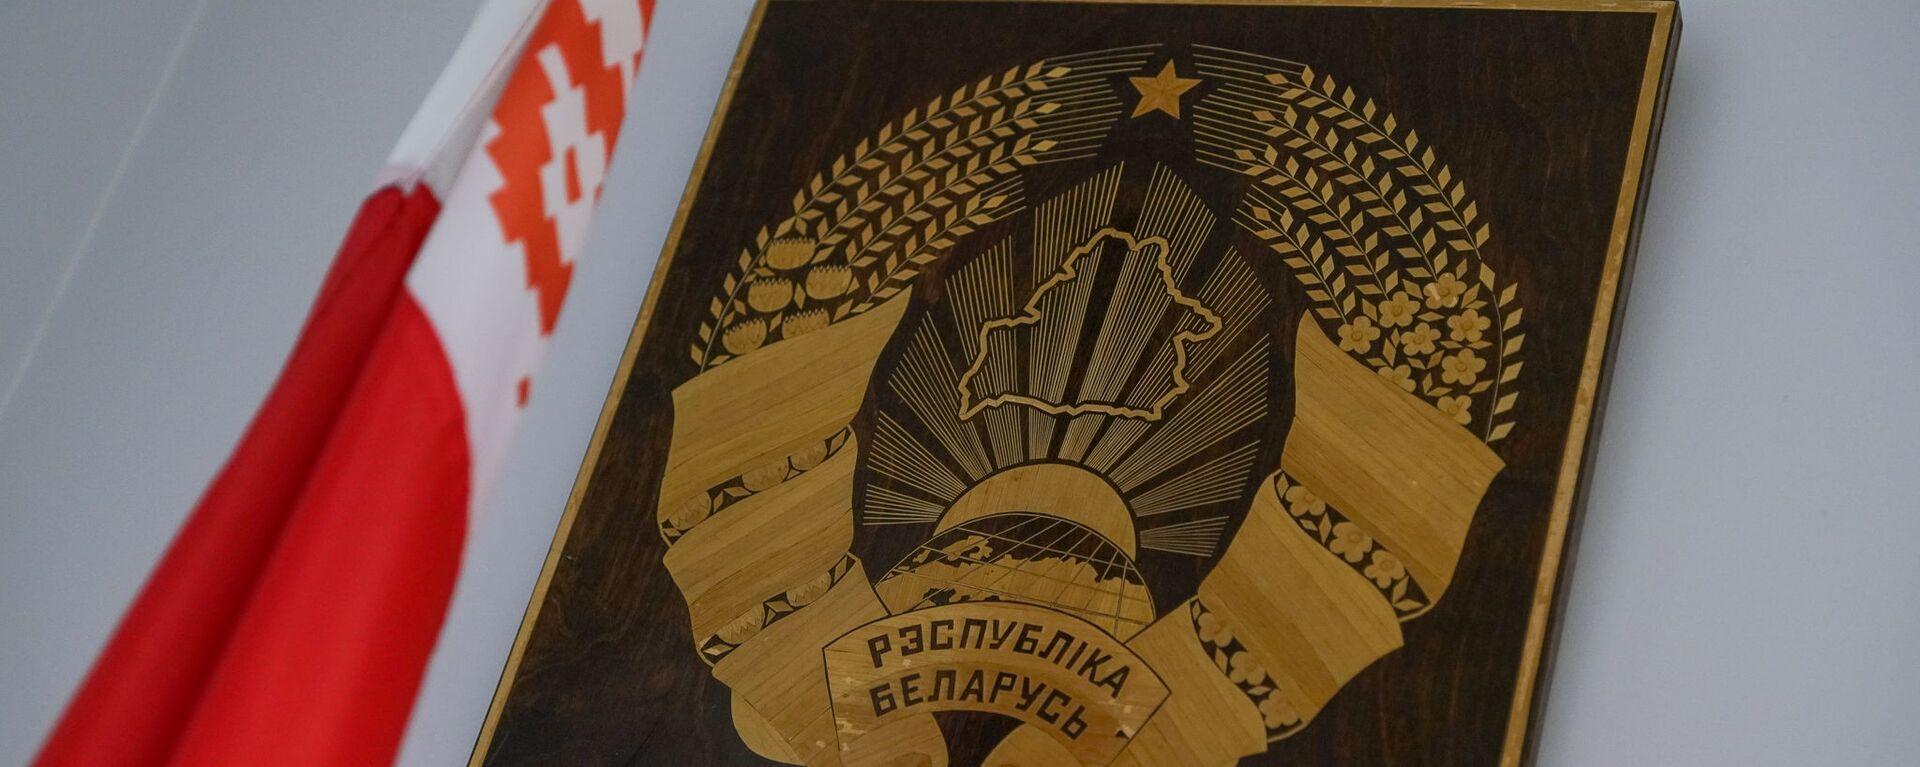 Флаг и герб Республики Беларусь - Sputnik Латвия, 1920, 28.06.2021